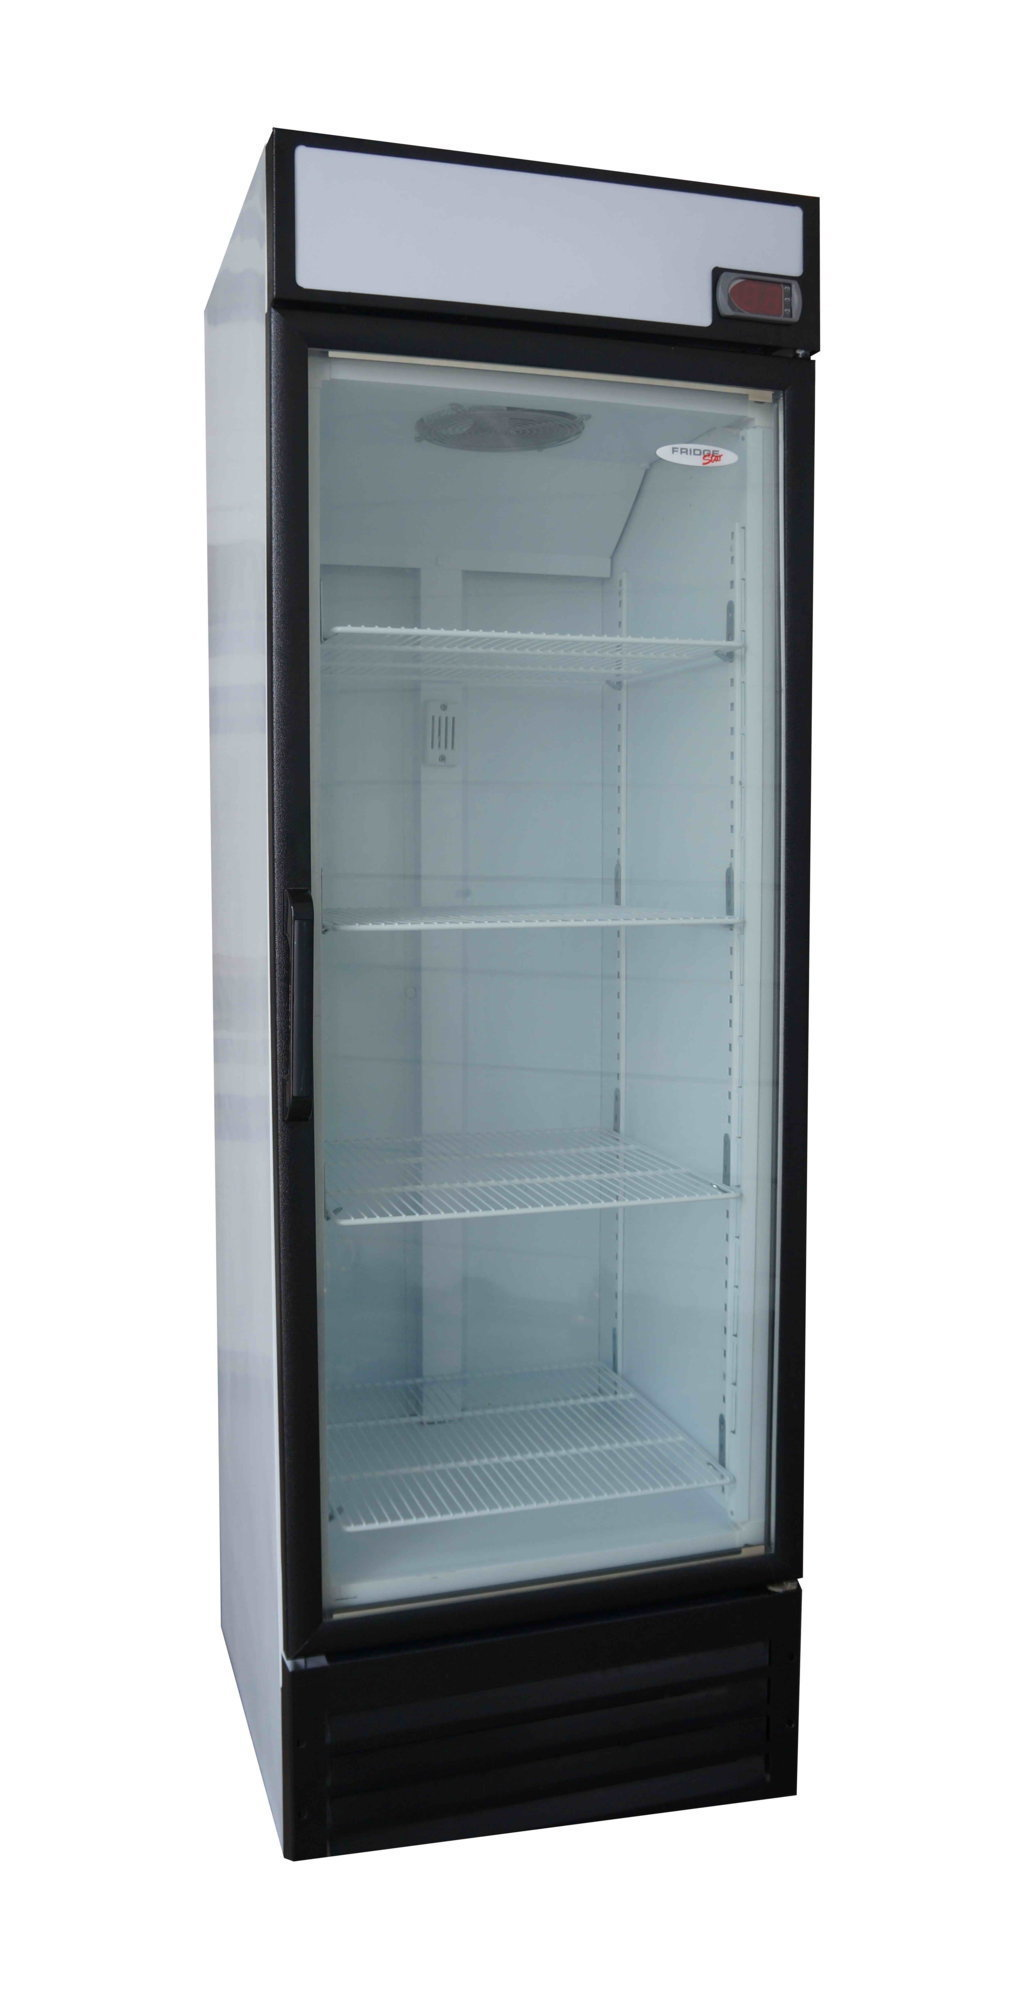 Fridge Star 420lt Glass Door Freezer Direct Cooling